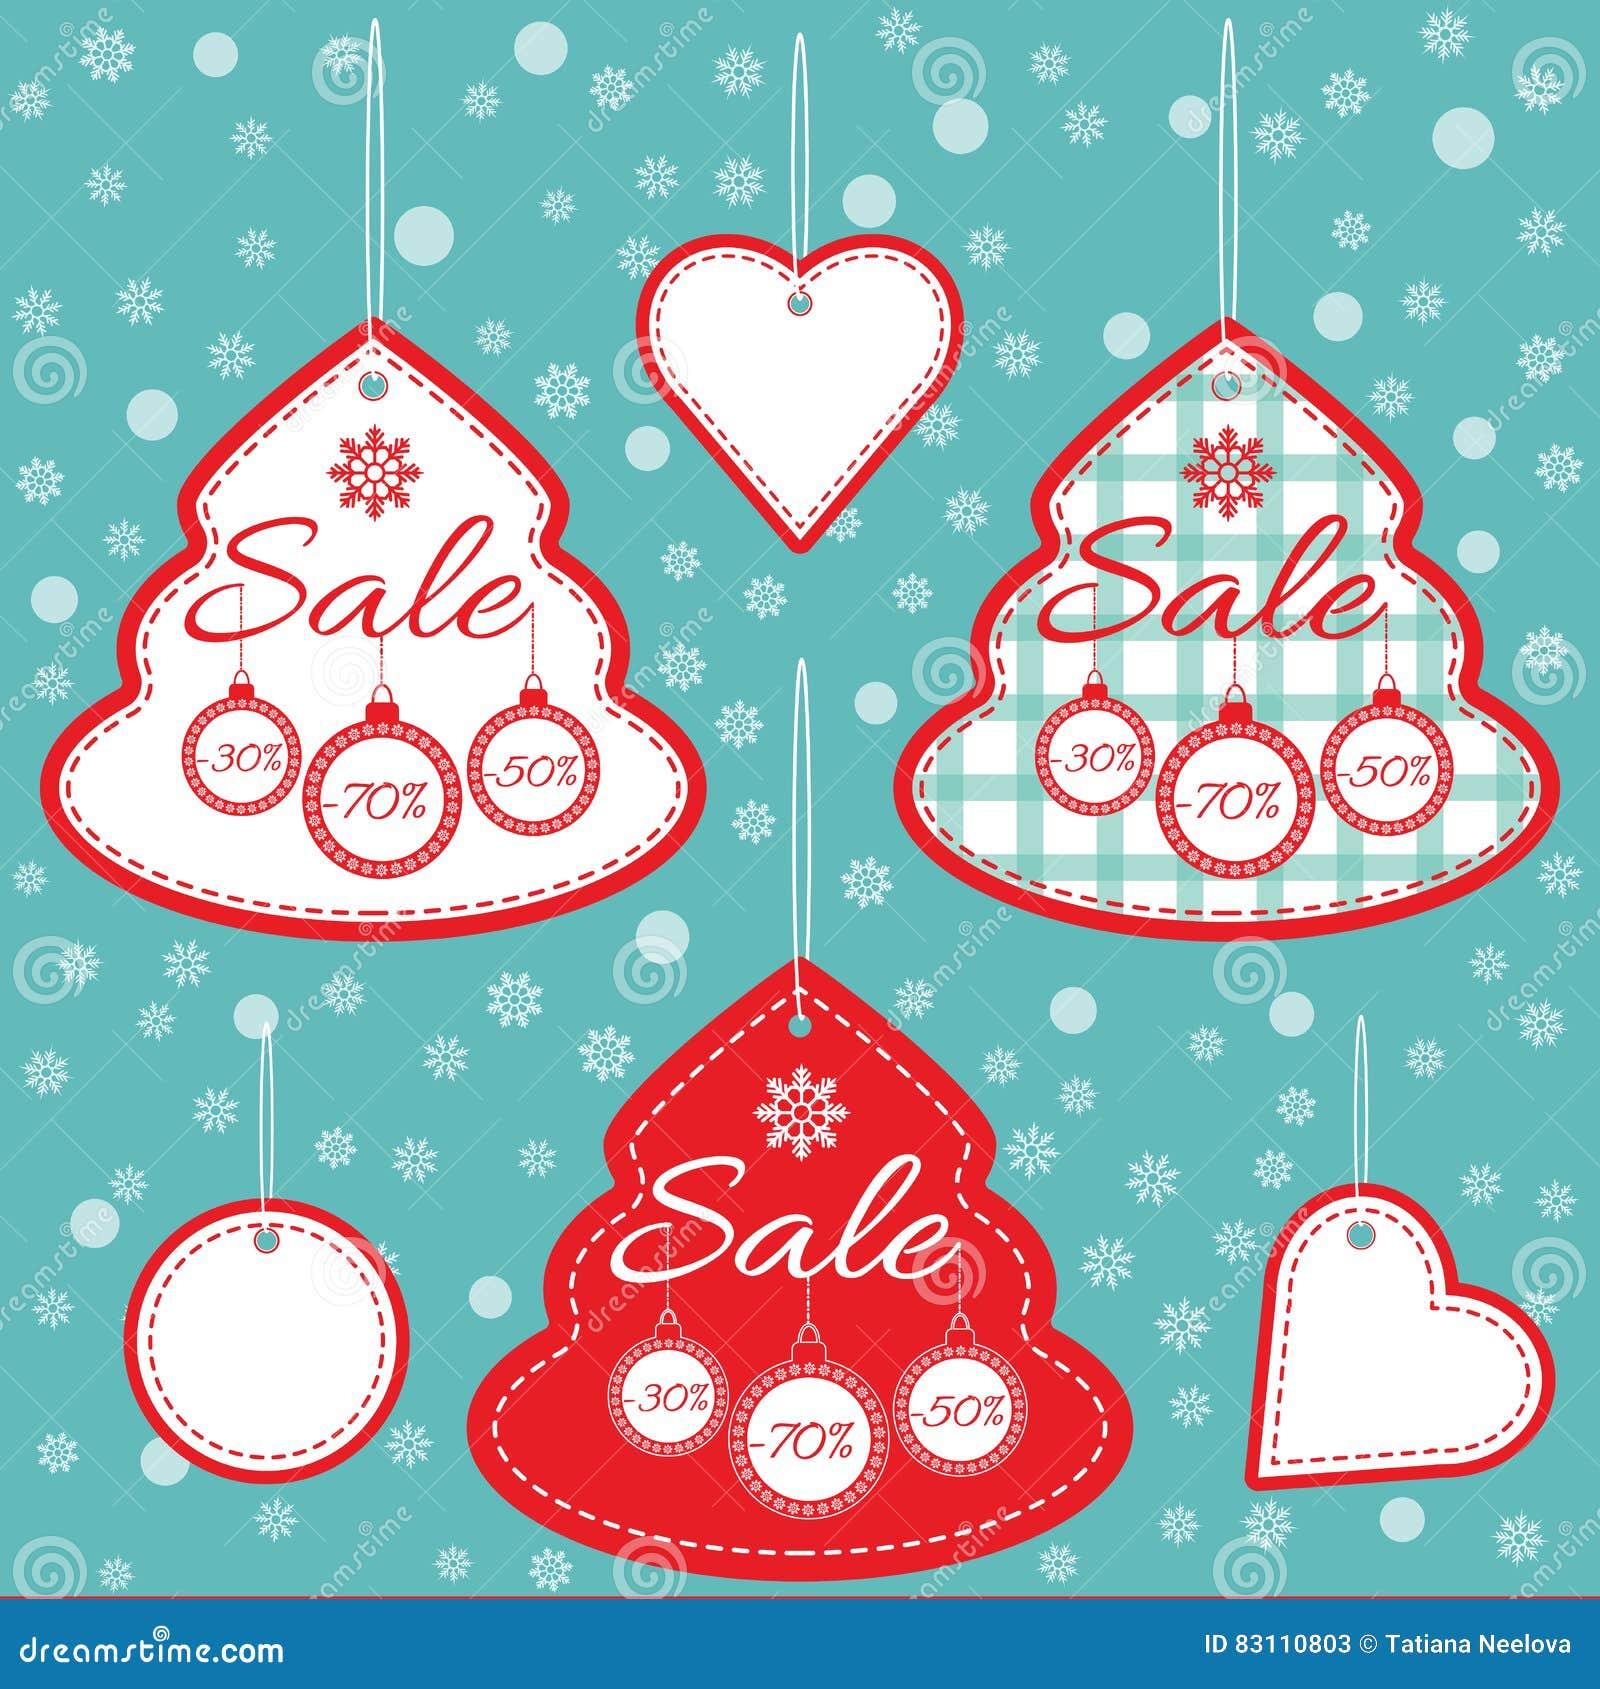 super special offer banner market shop poster design market shop poster design christmas or new year